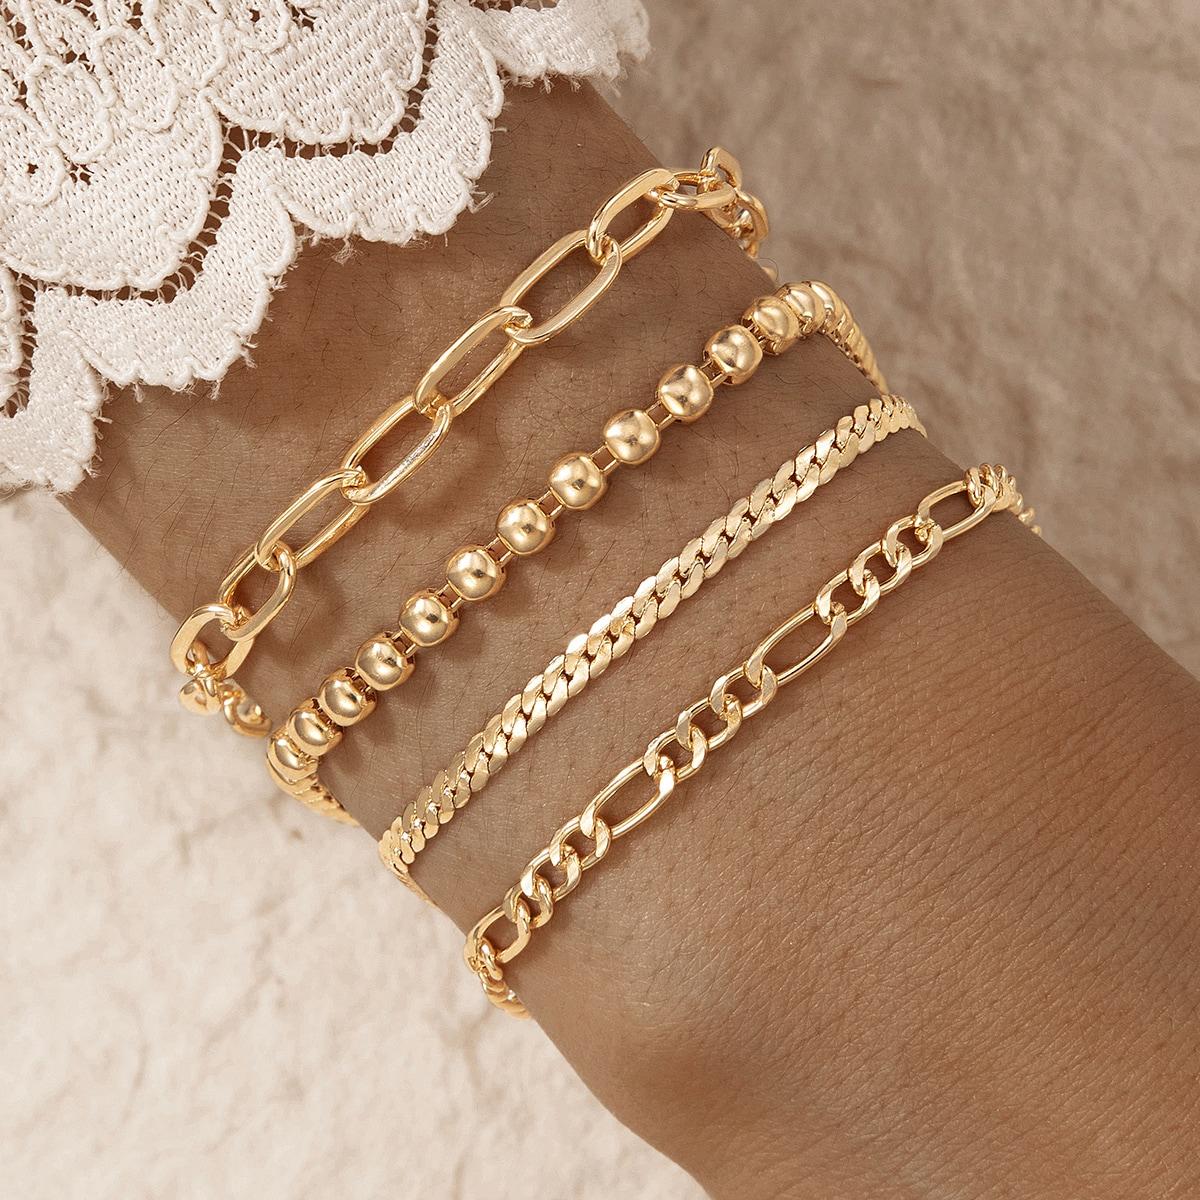 4 Stücke Armband mit Metall Kette